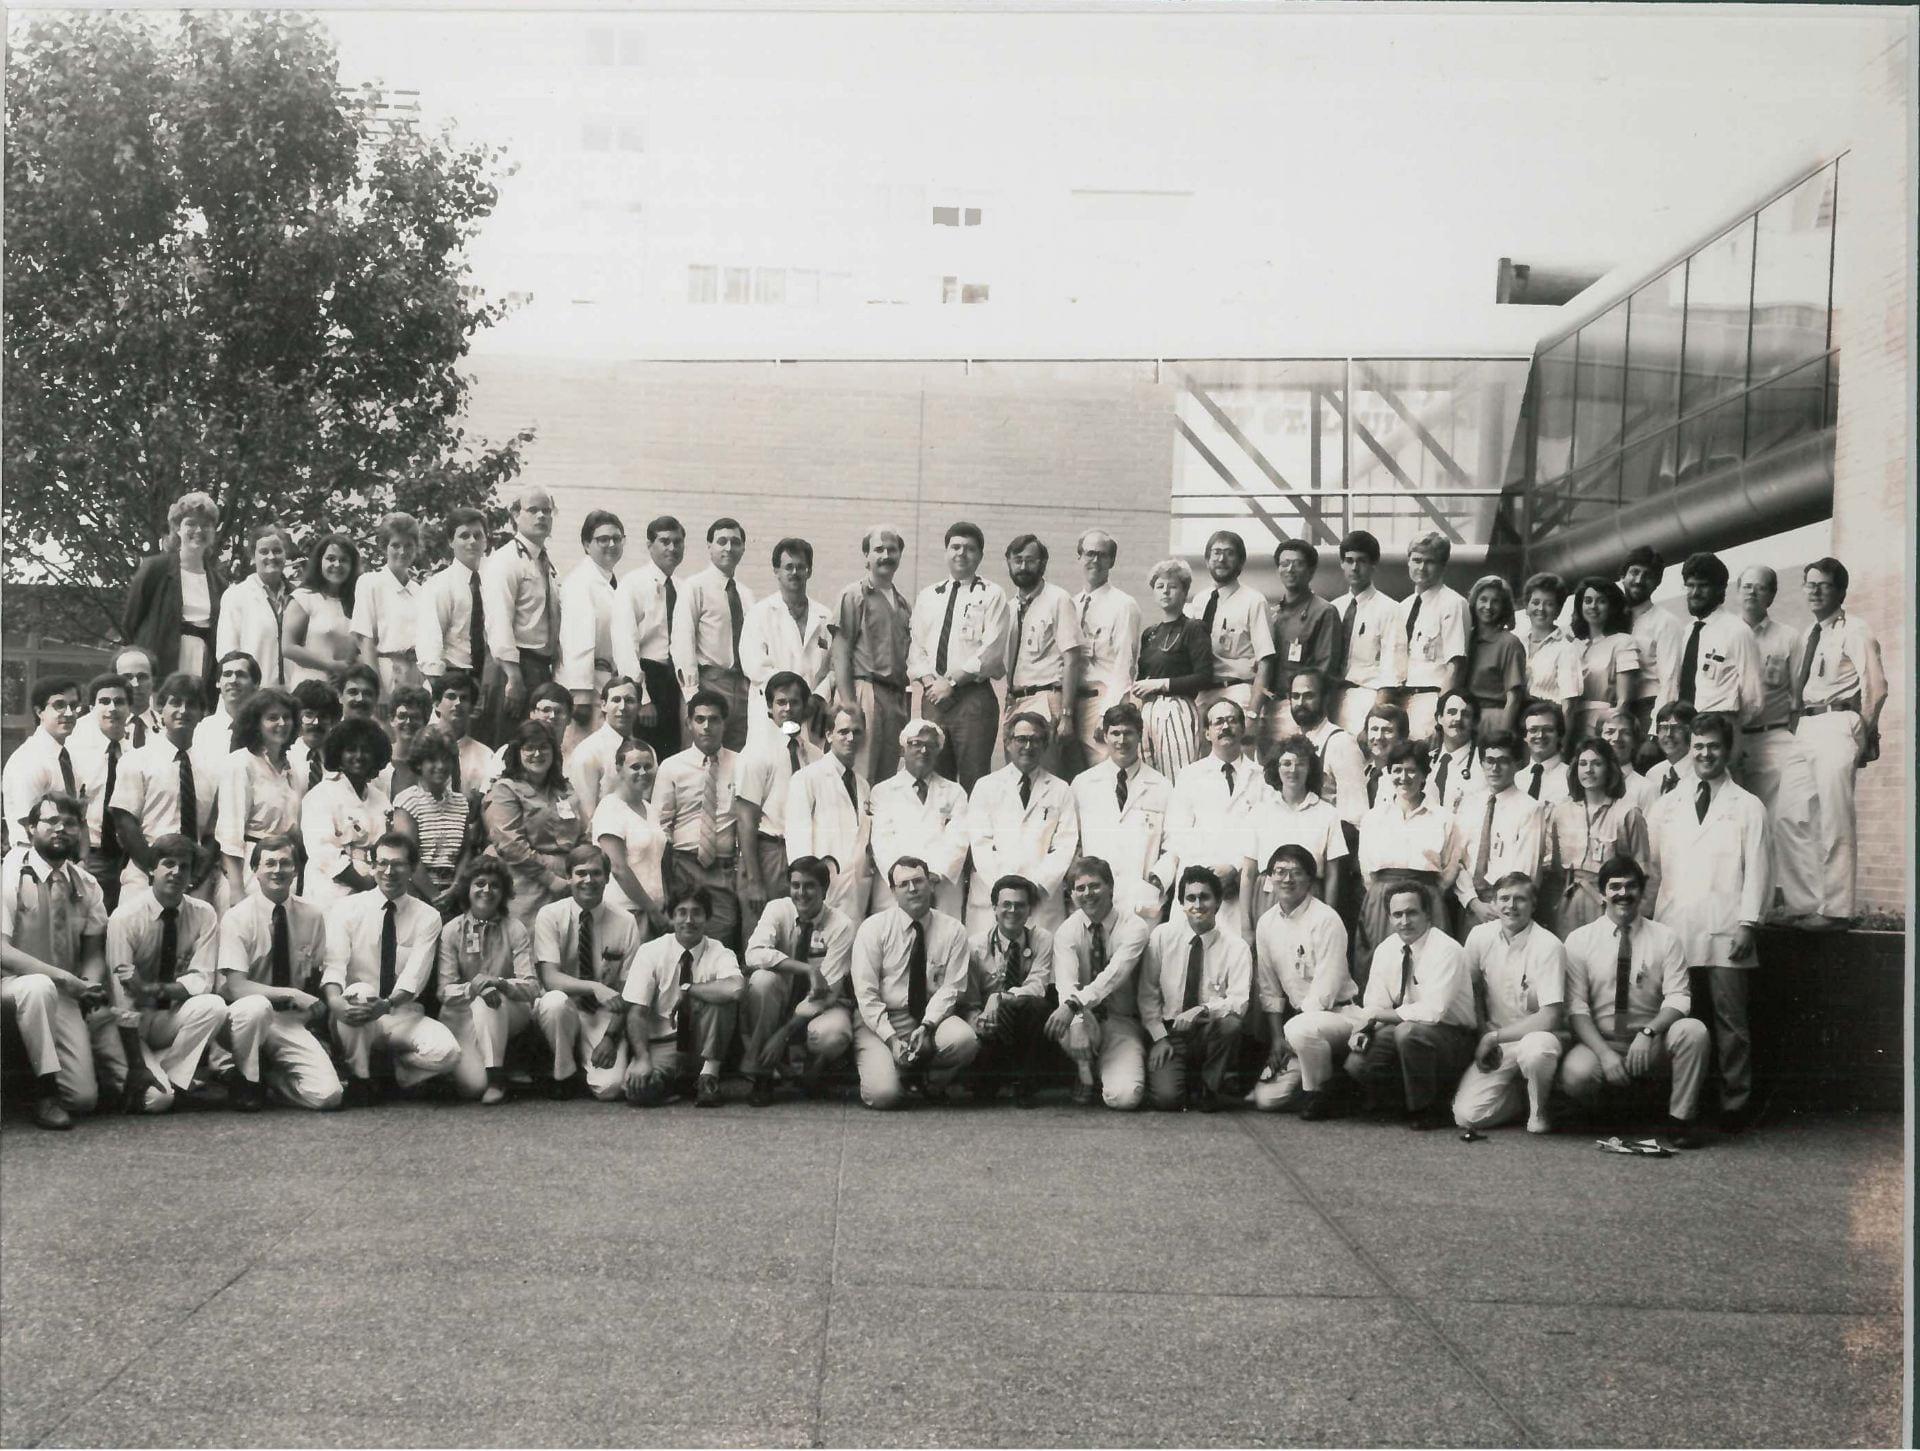 1987 Housestaff Photo